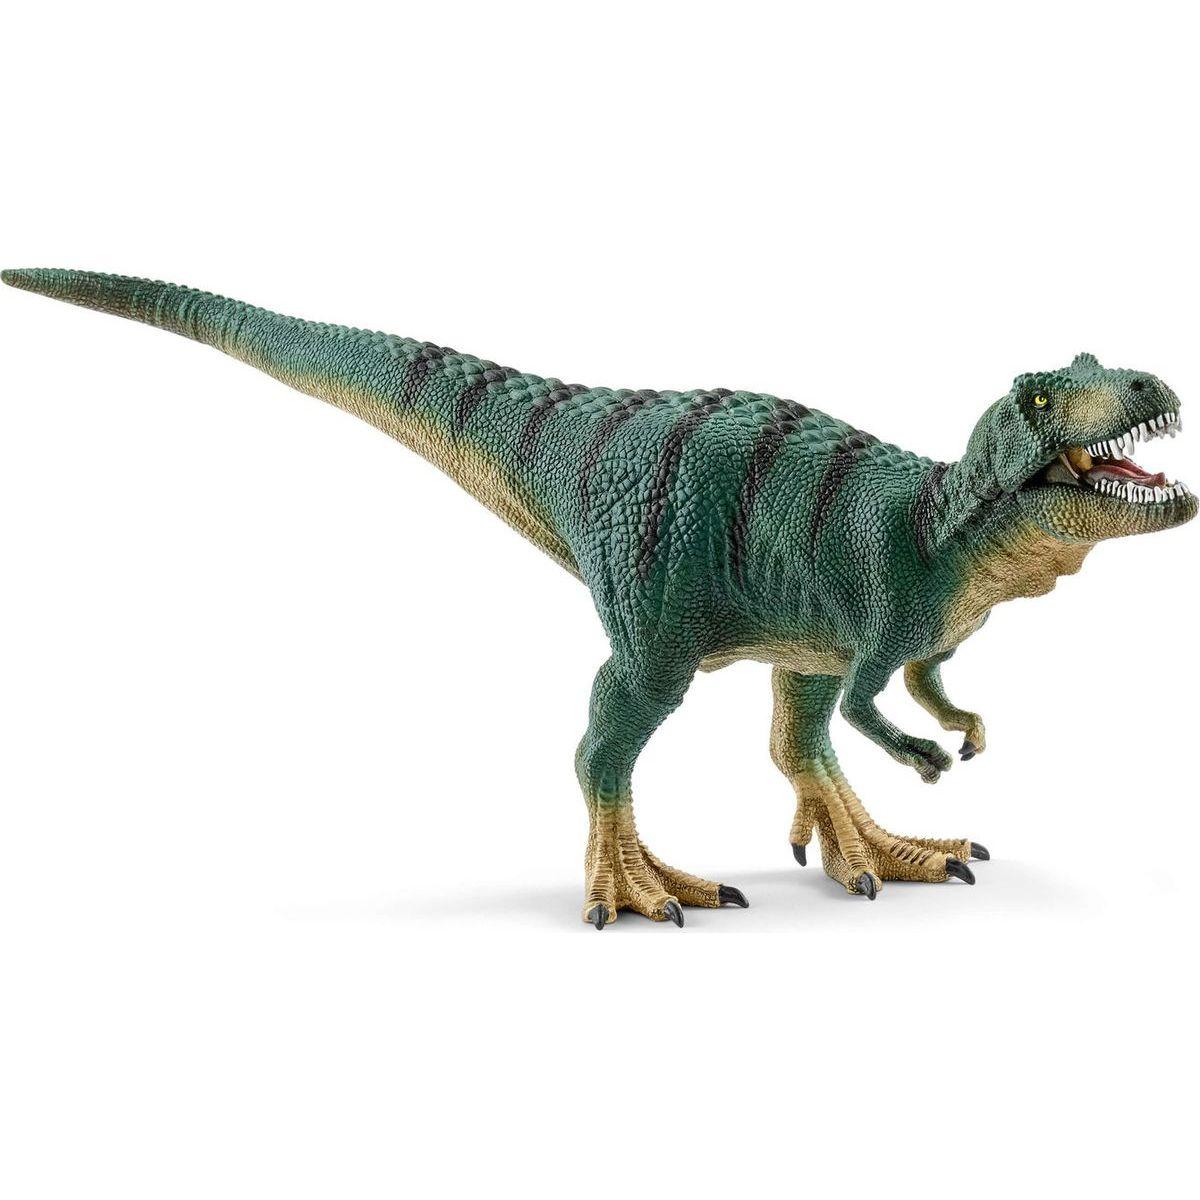 Schleich 15007 Prehistorické zvieratko Tyrannosaurus Rex mláďa